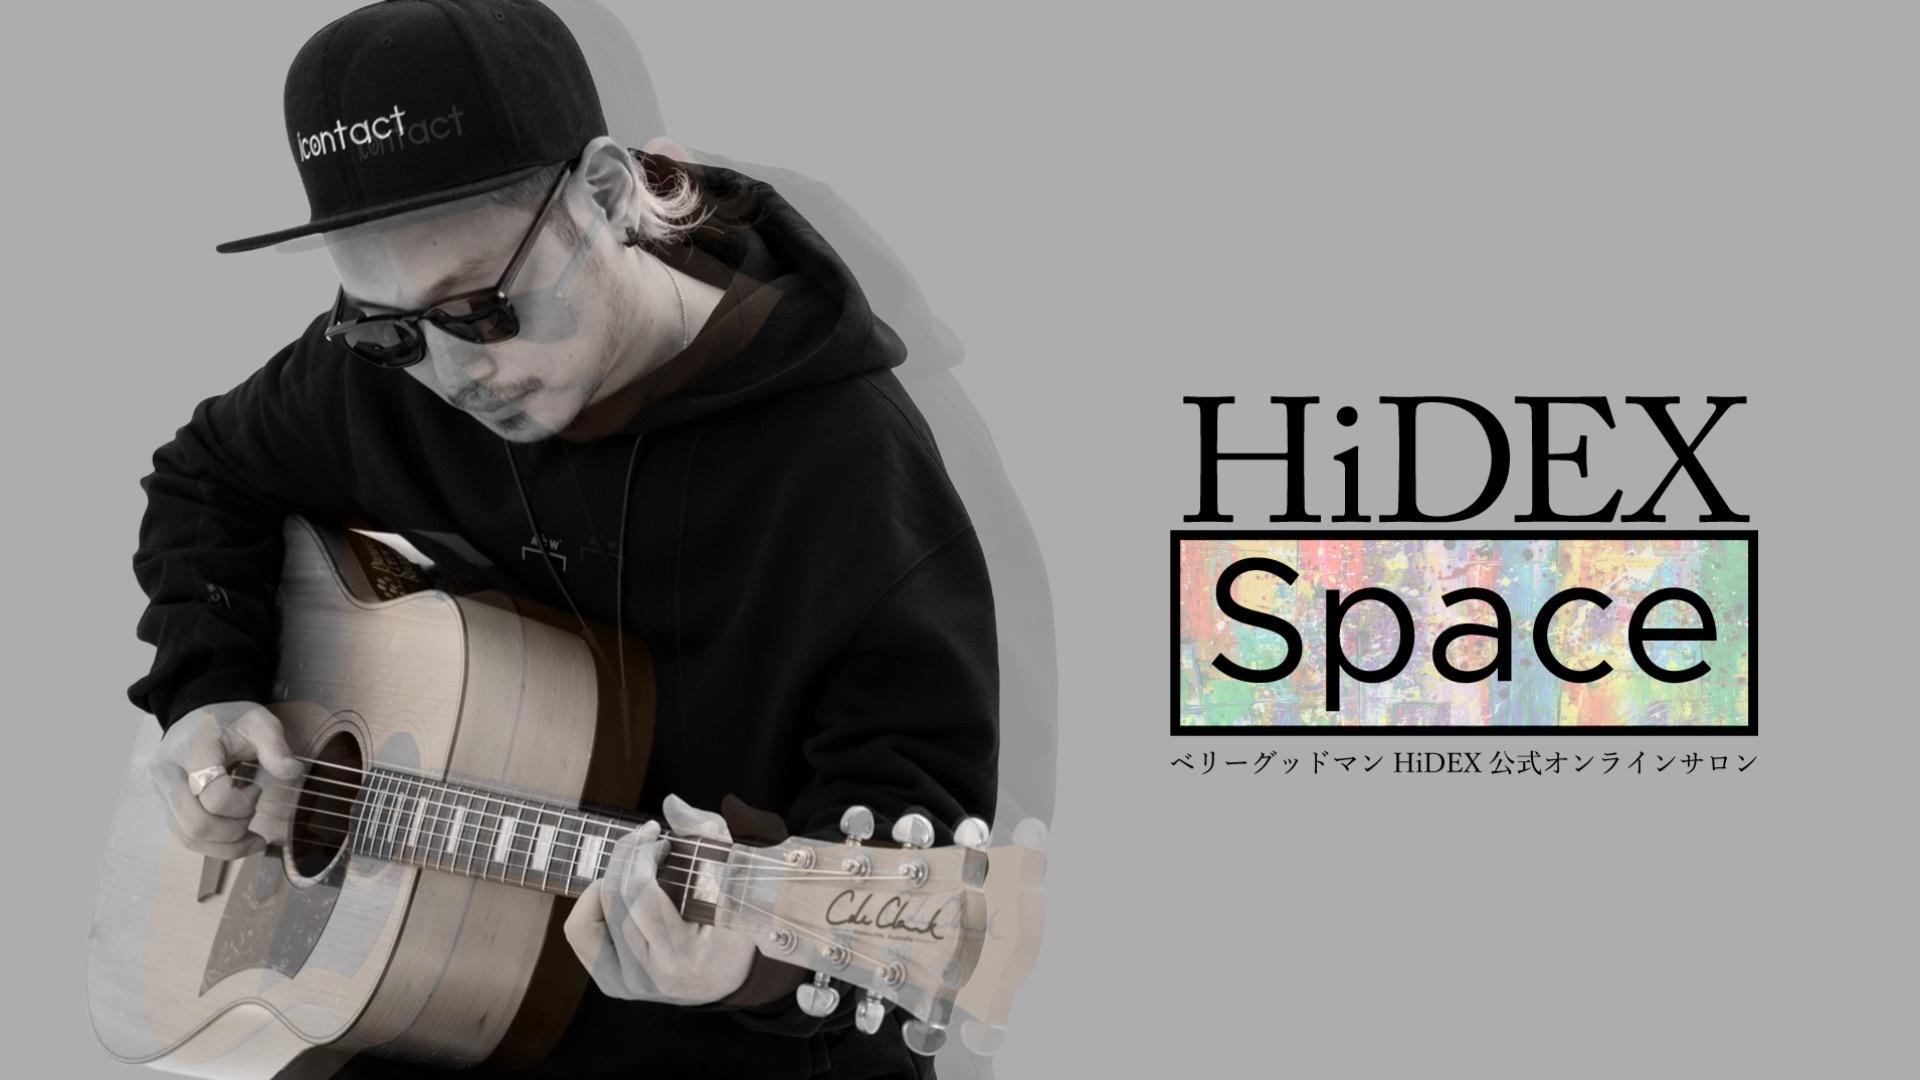 HiDEX Space